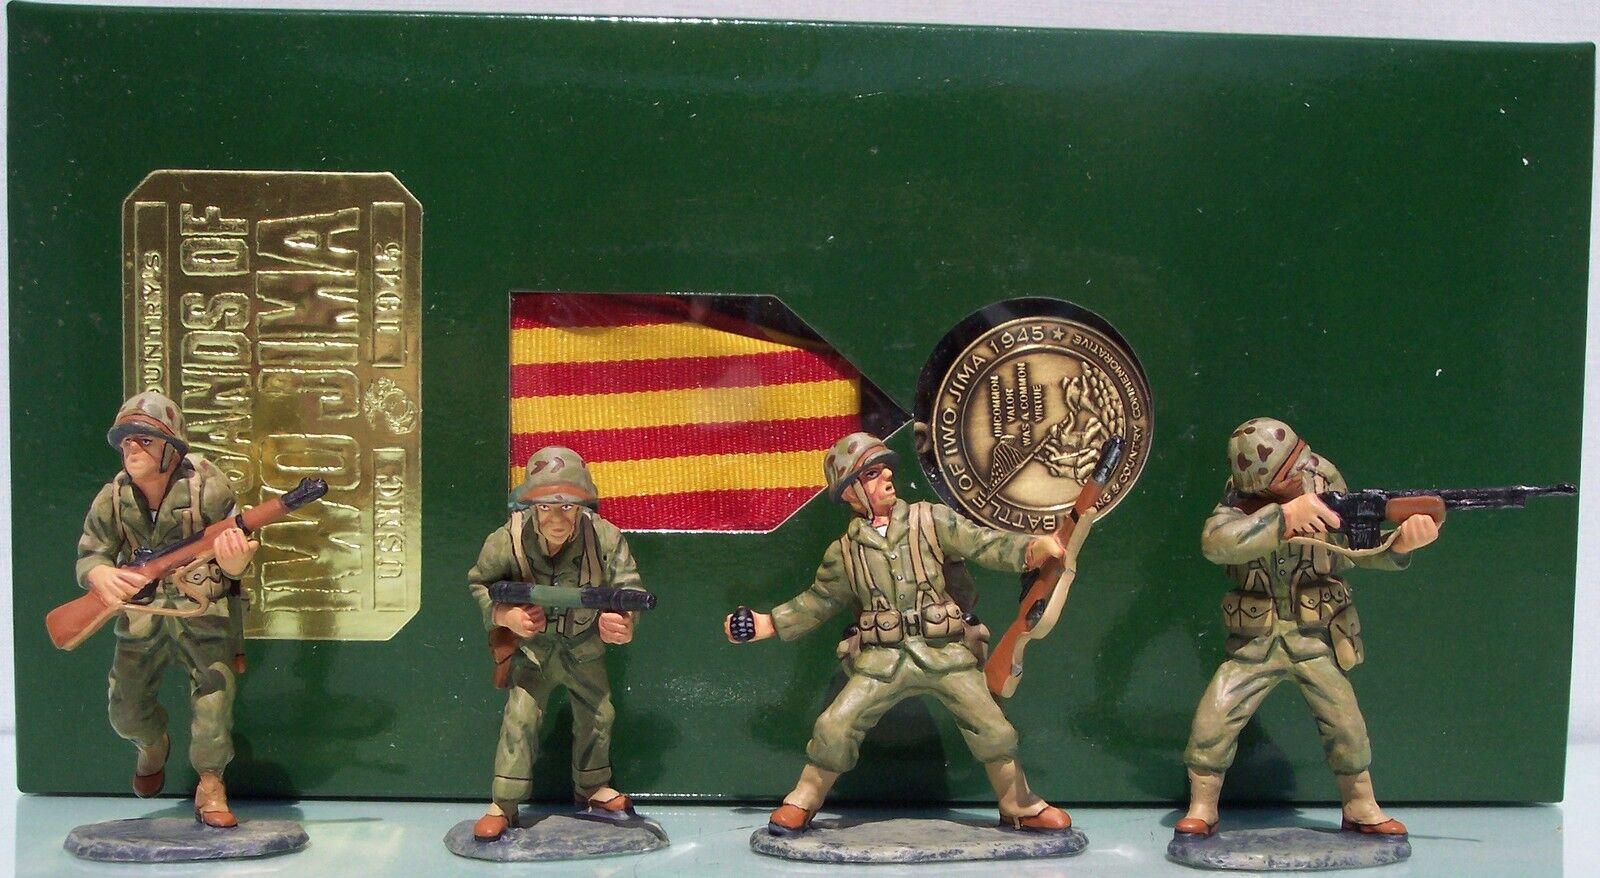 King & Country Iwo Jima 55TH Aniversario Set 2 EE.UU. Marines Fuego Soporte Exib